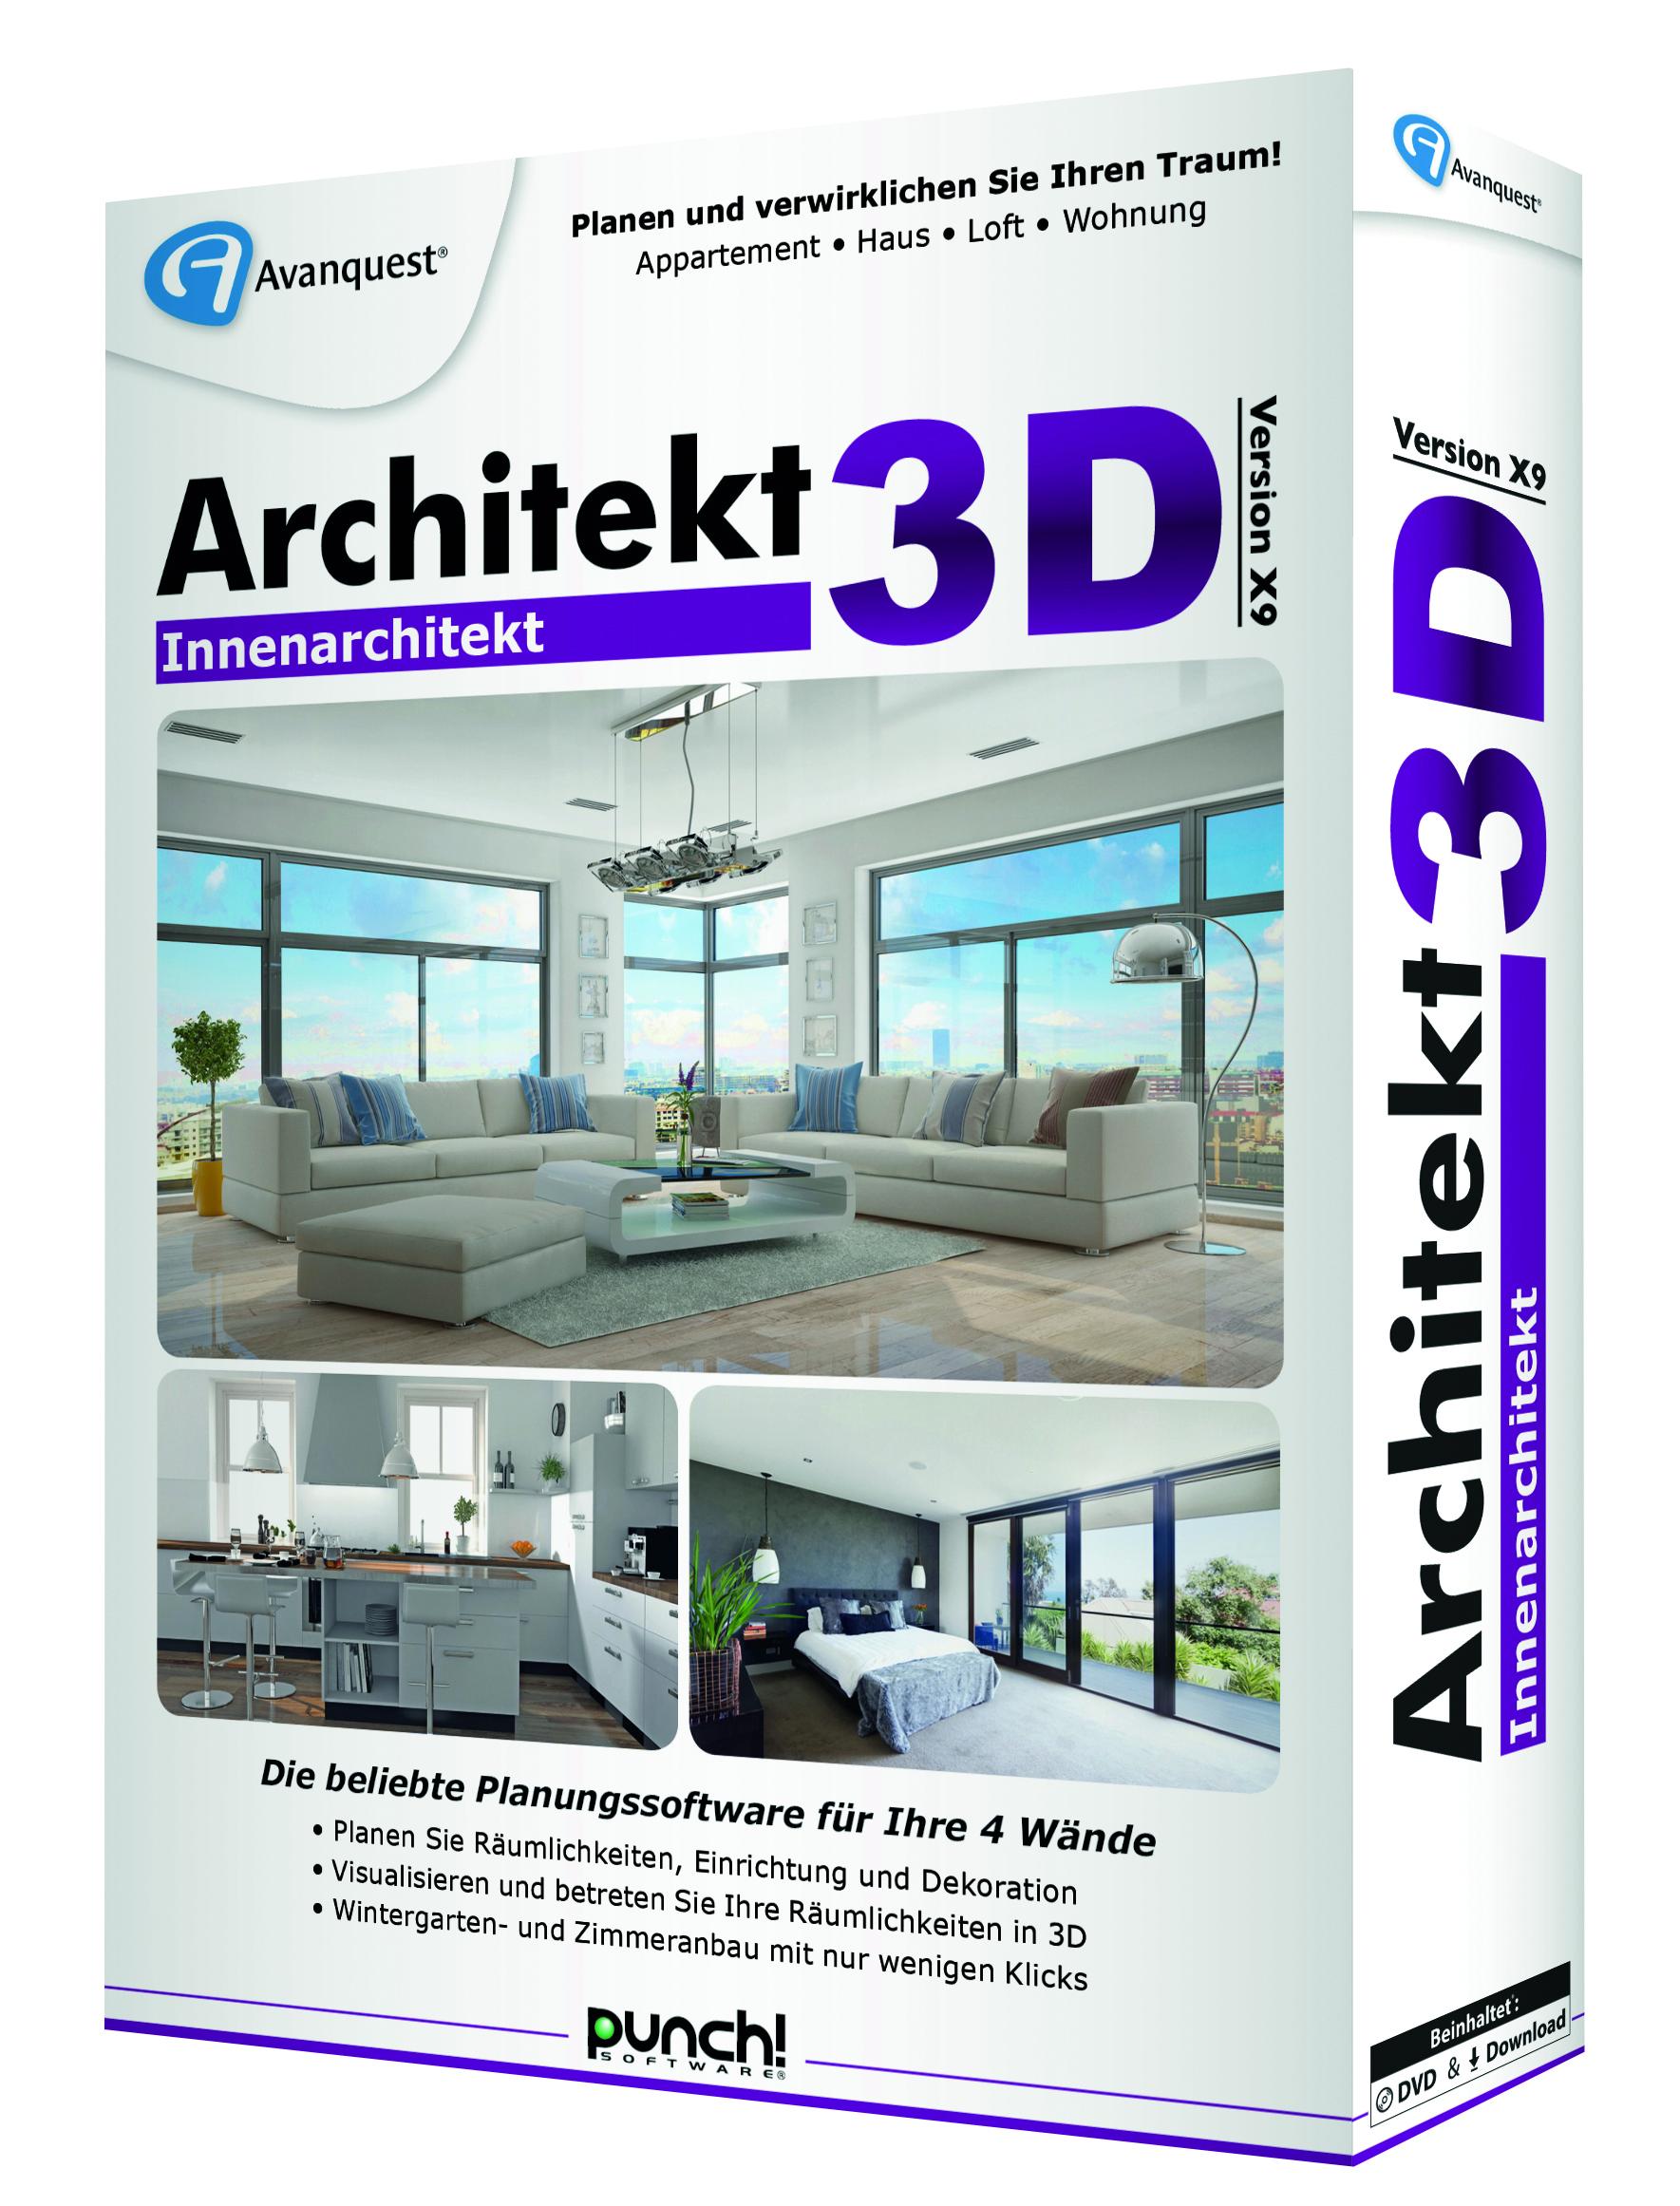 Architekt 3D Innenarchitekt X9 3D rechts 300dpi CMYK